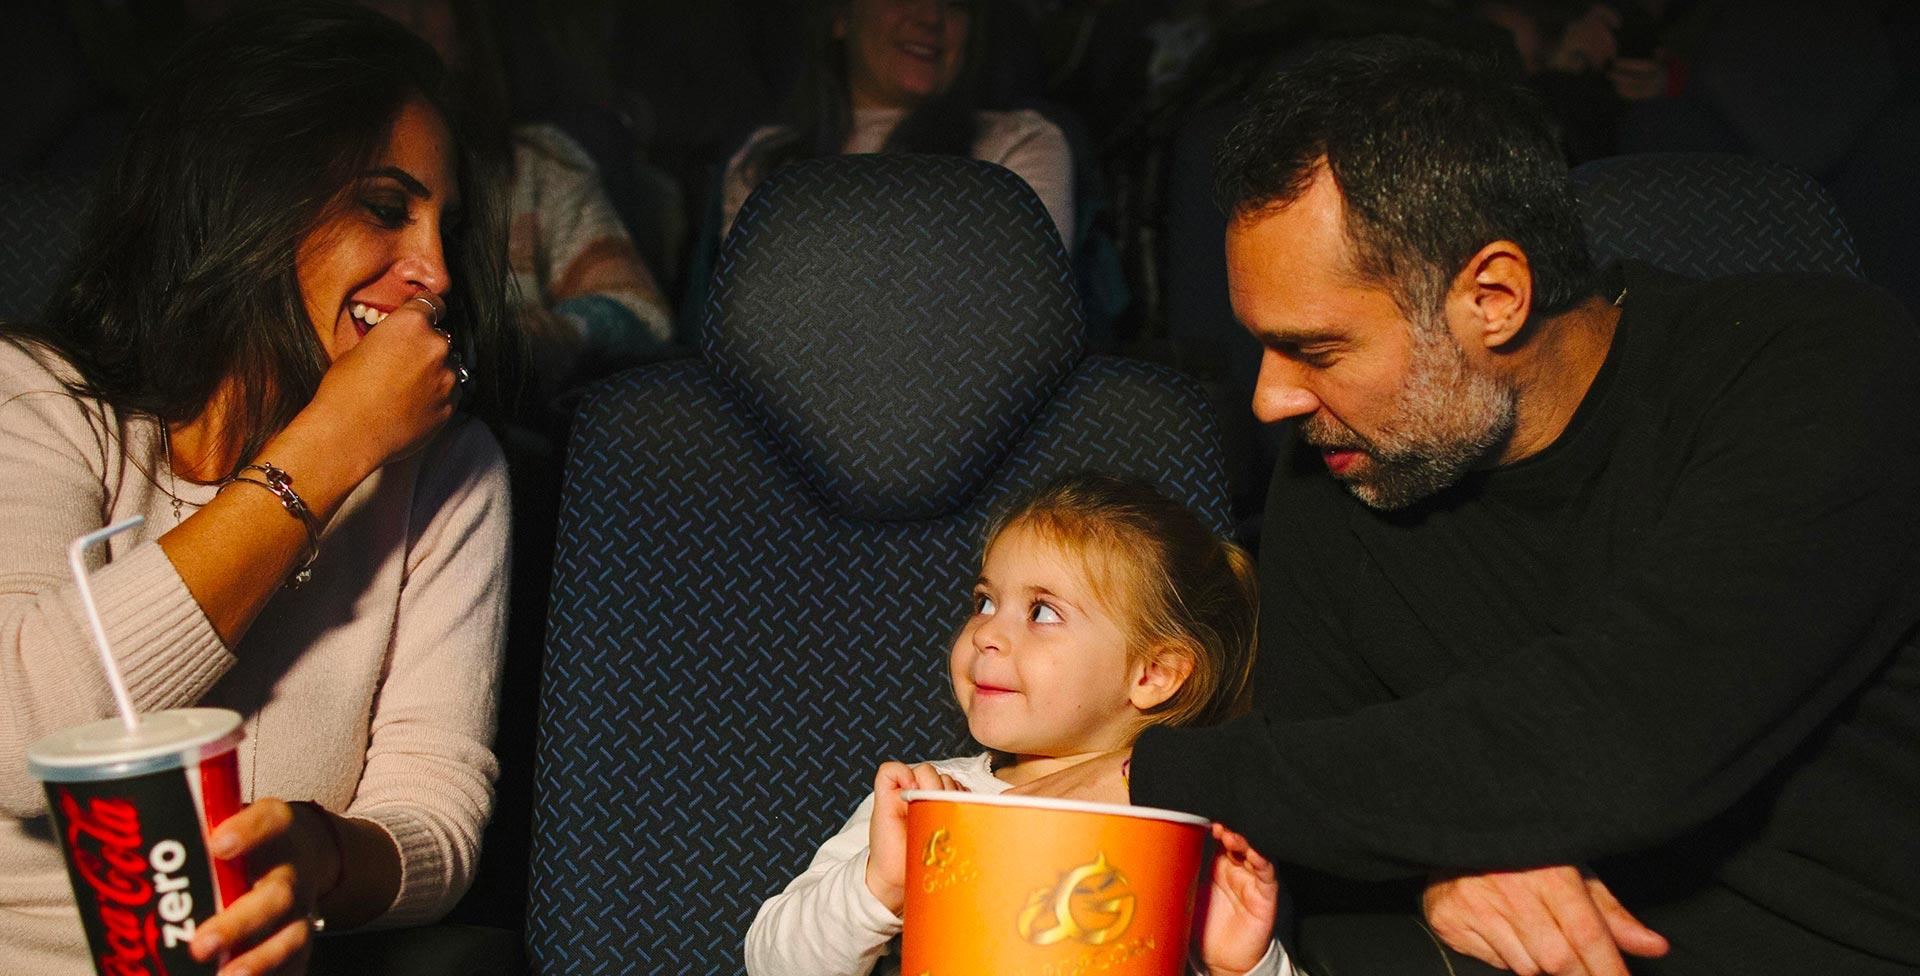 CinemaCity Ravenna - ideale per le famiglie